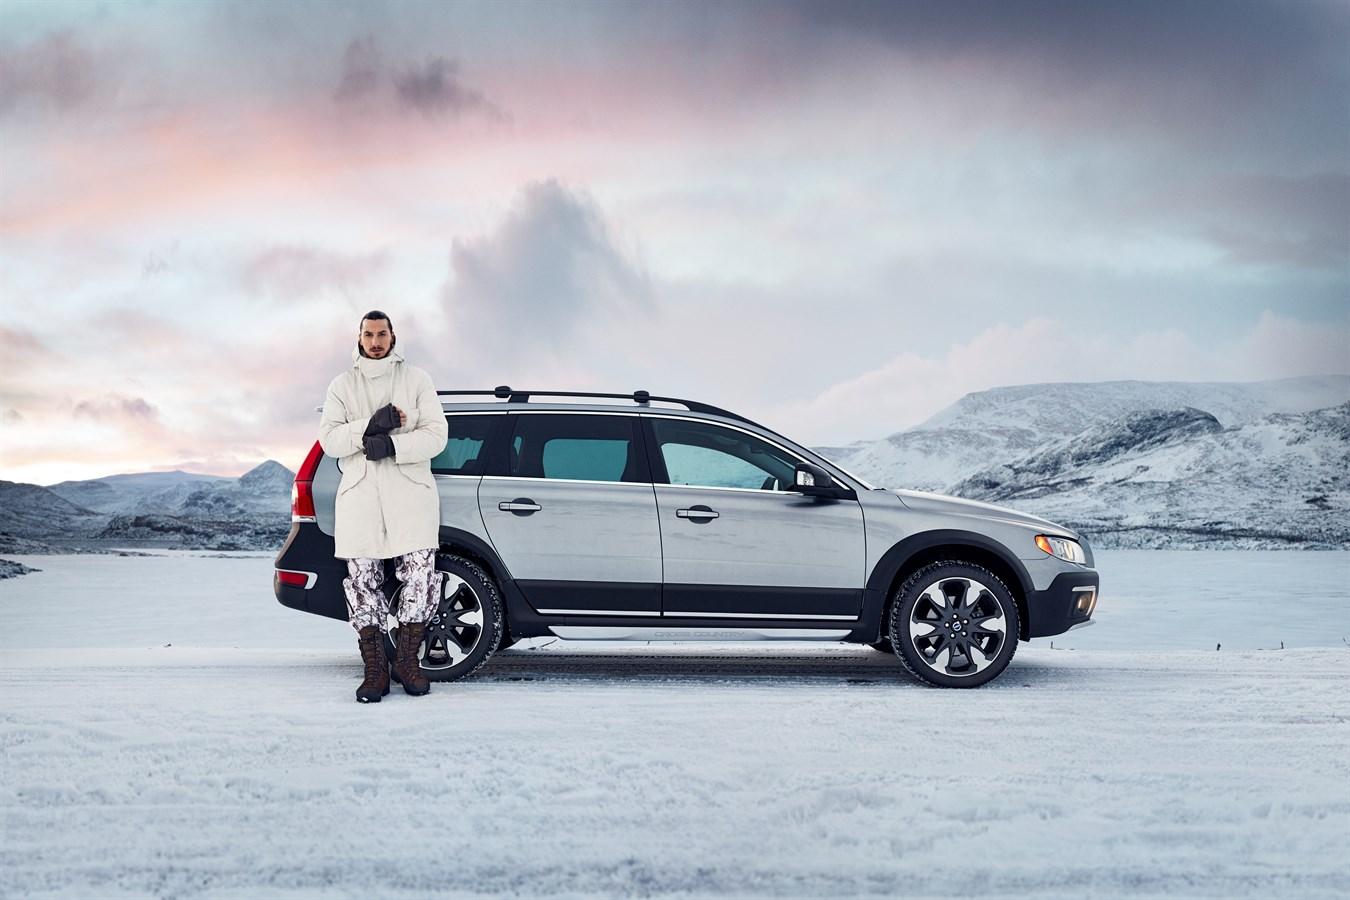 Swedish icons Volvo Cars, Zlatan Ibrahimović and Max Martin celebrate Sweden together